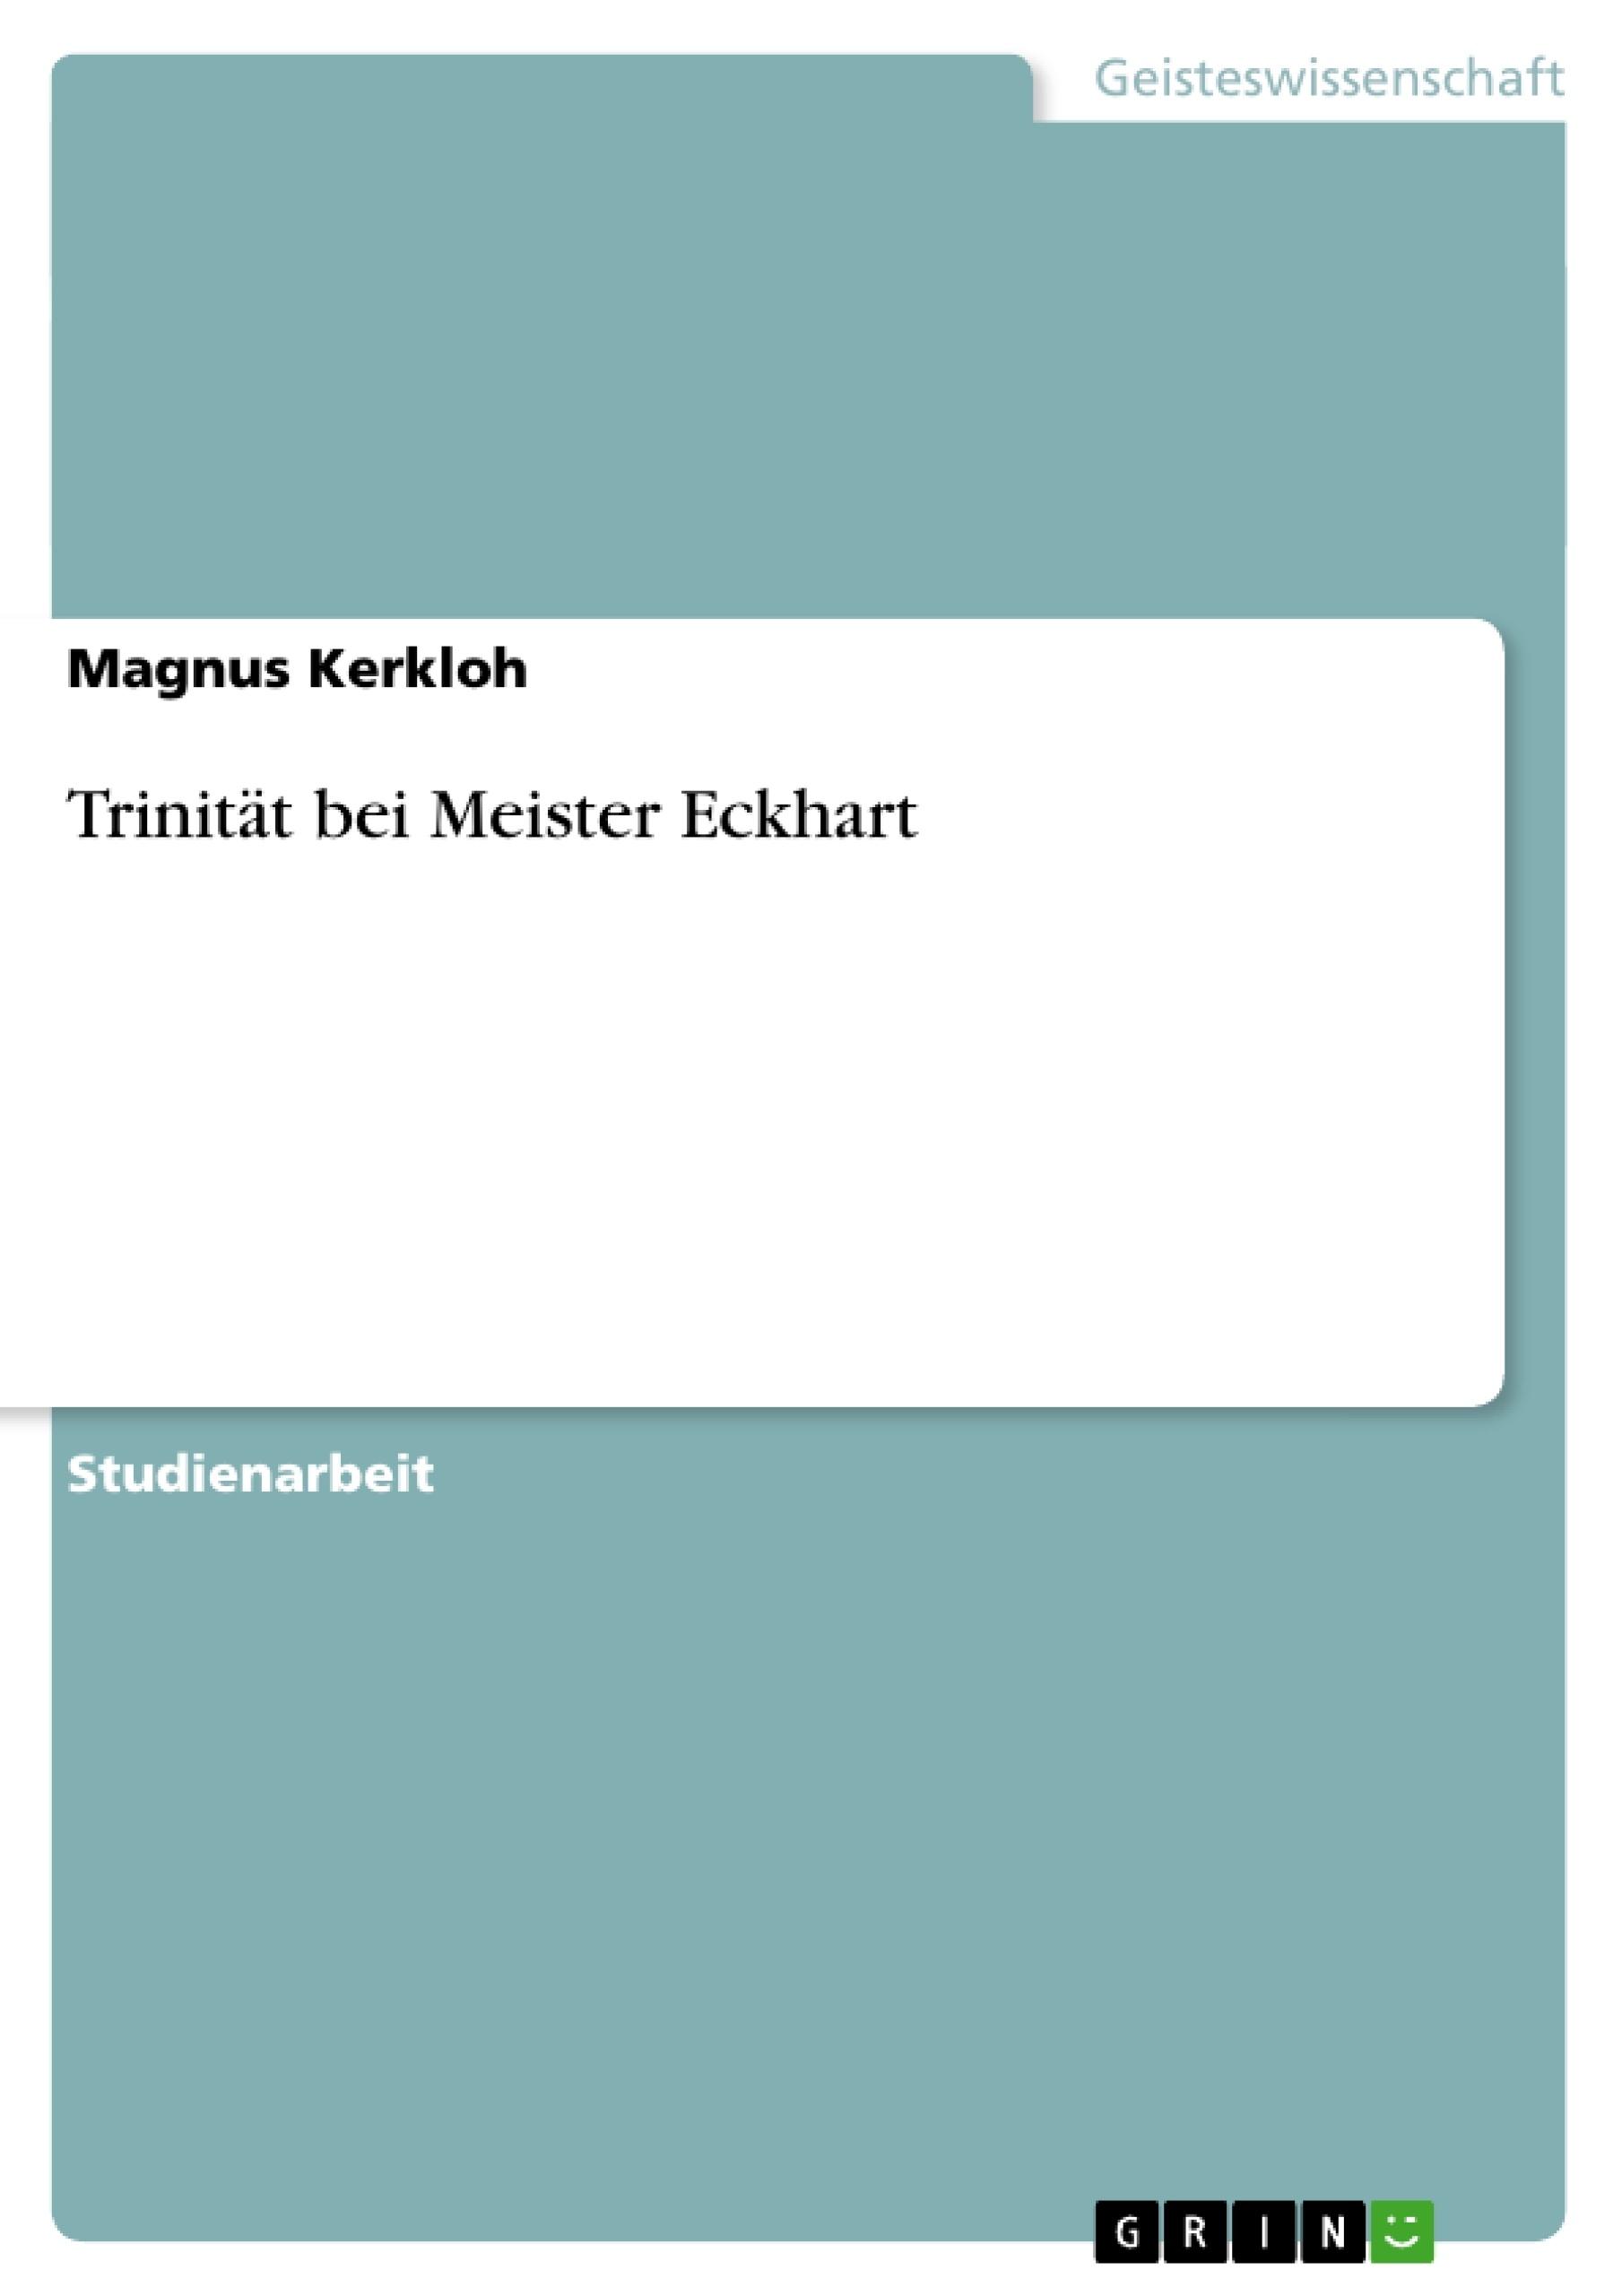 Titel: Trinität bei Meister Eckhart